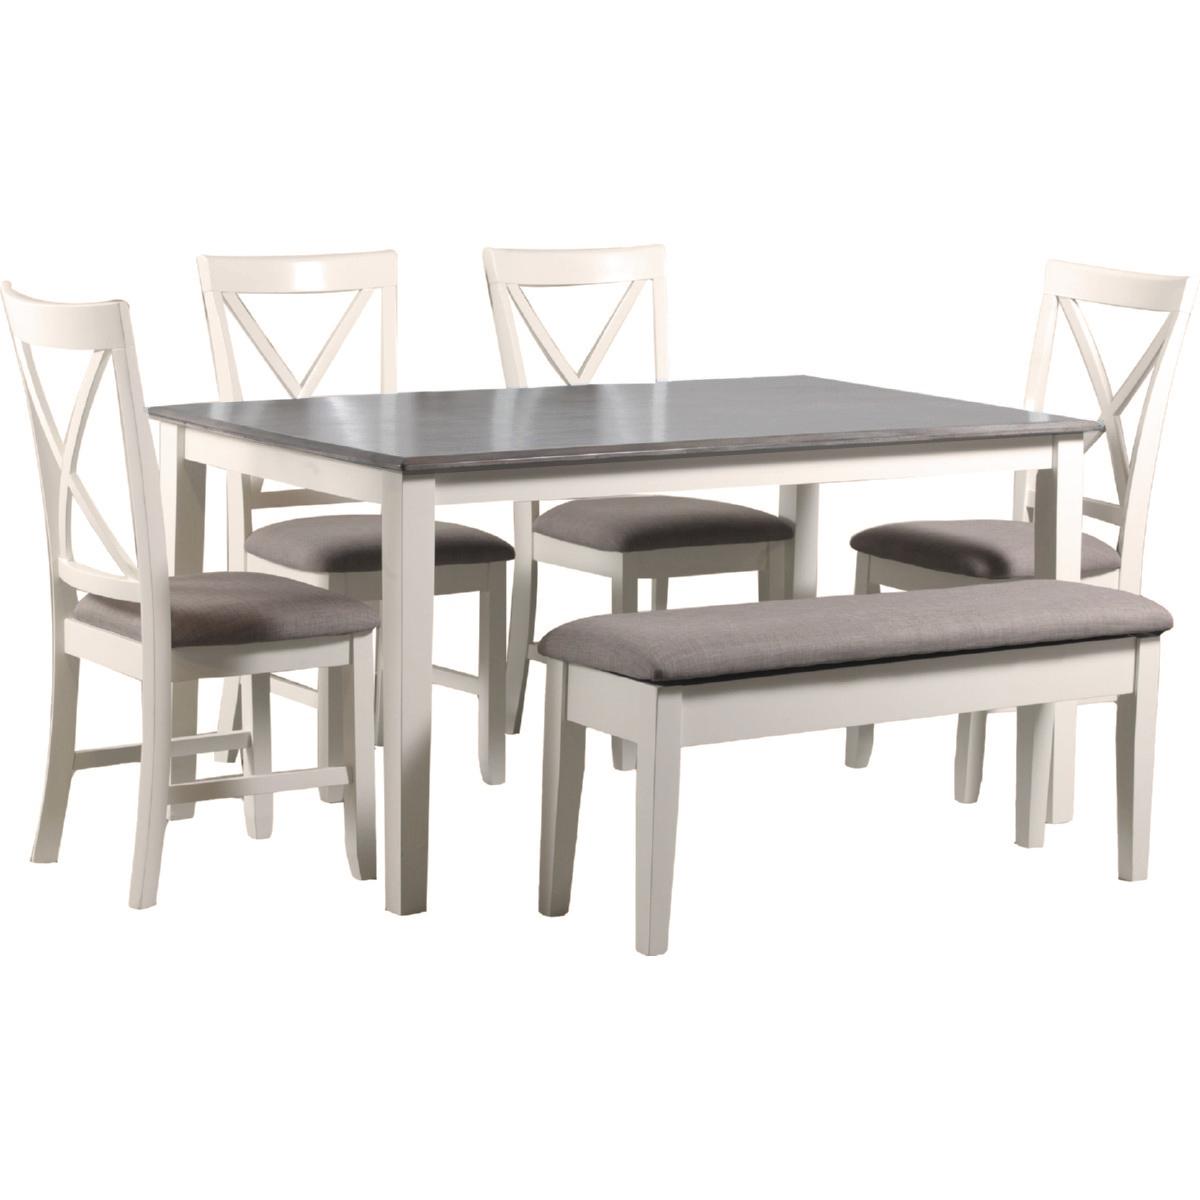 jane 6 piece dining set in white restoration finish u0026 grey fabric table bench u0026 4 chairs